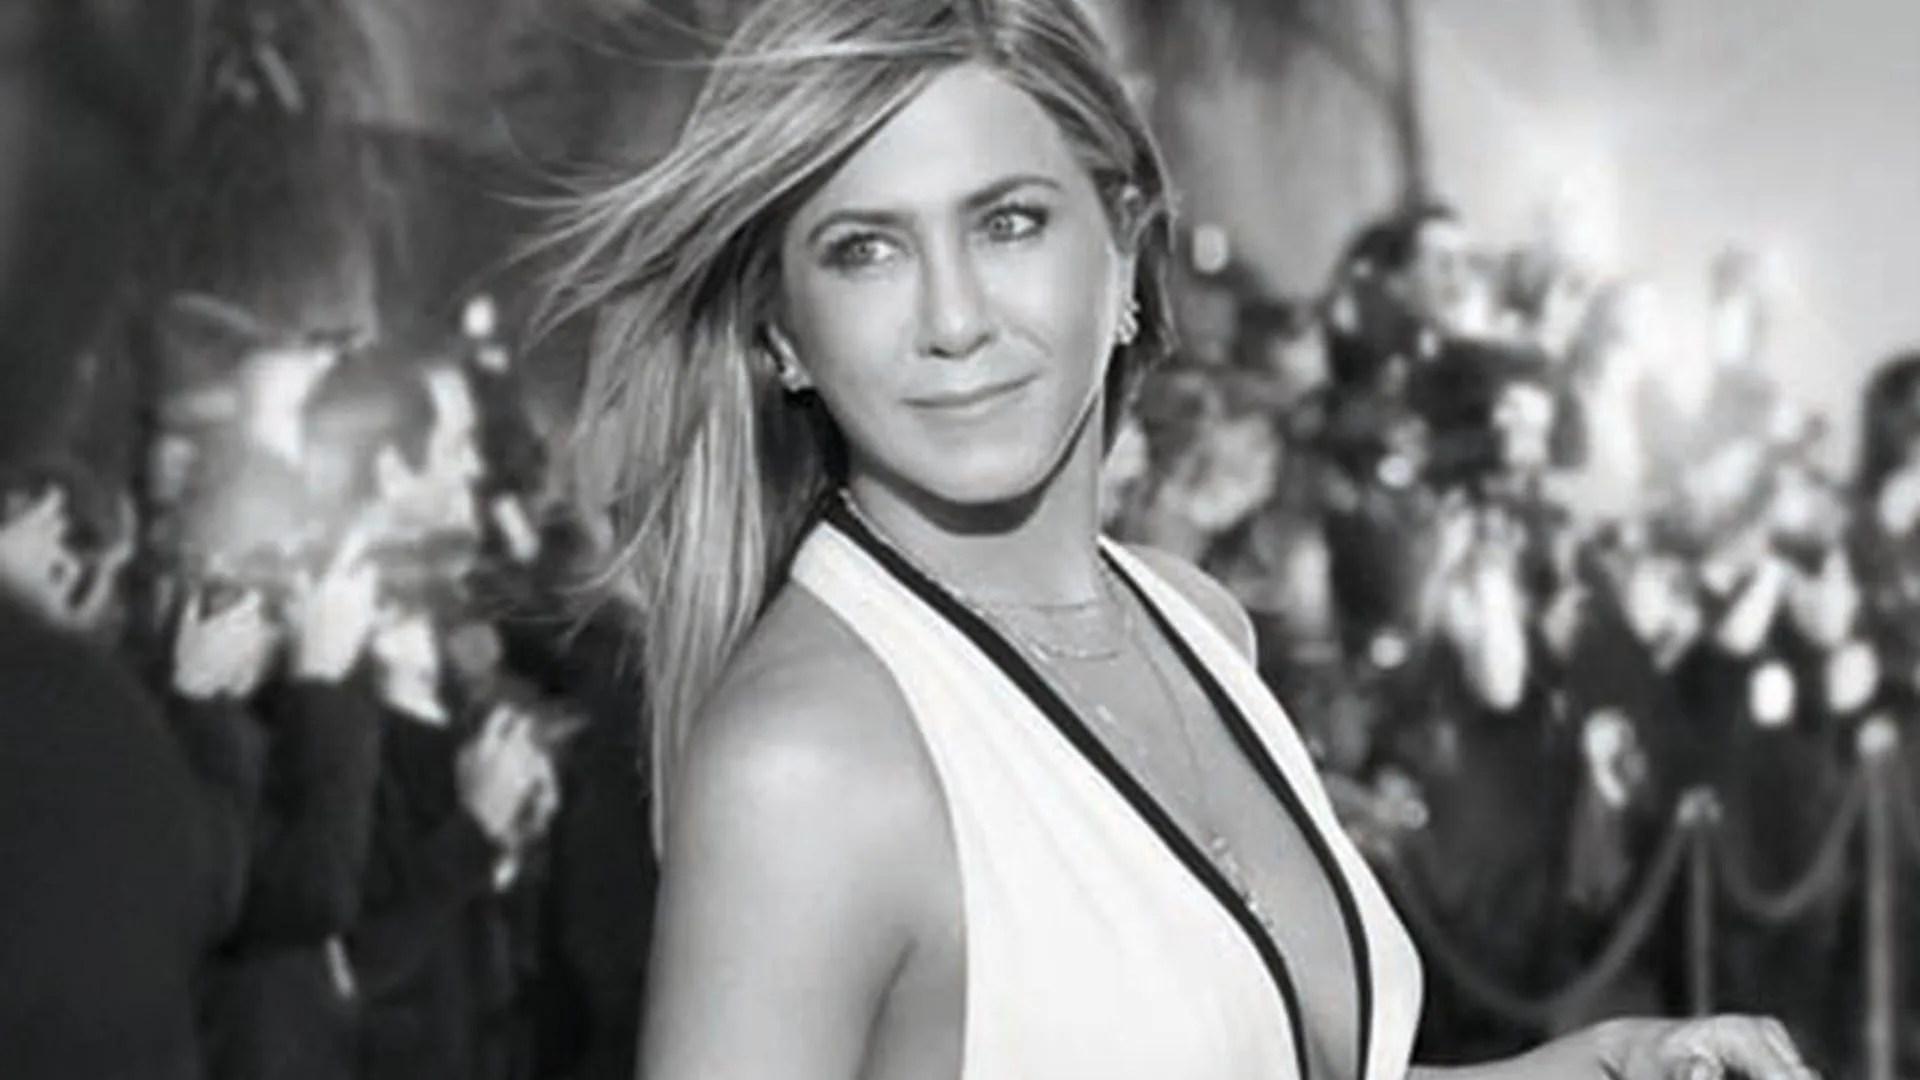 Fitness Girl Wallpaper 1920x1080 Jennifer Aniston Looks Flawless In Striking New Campaign